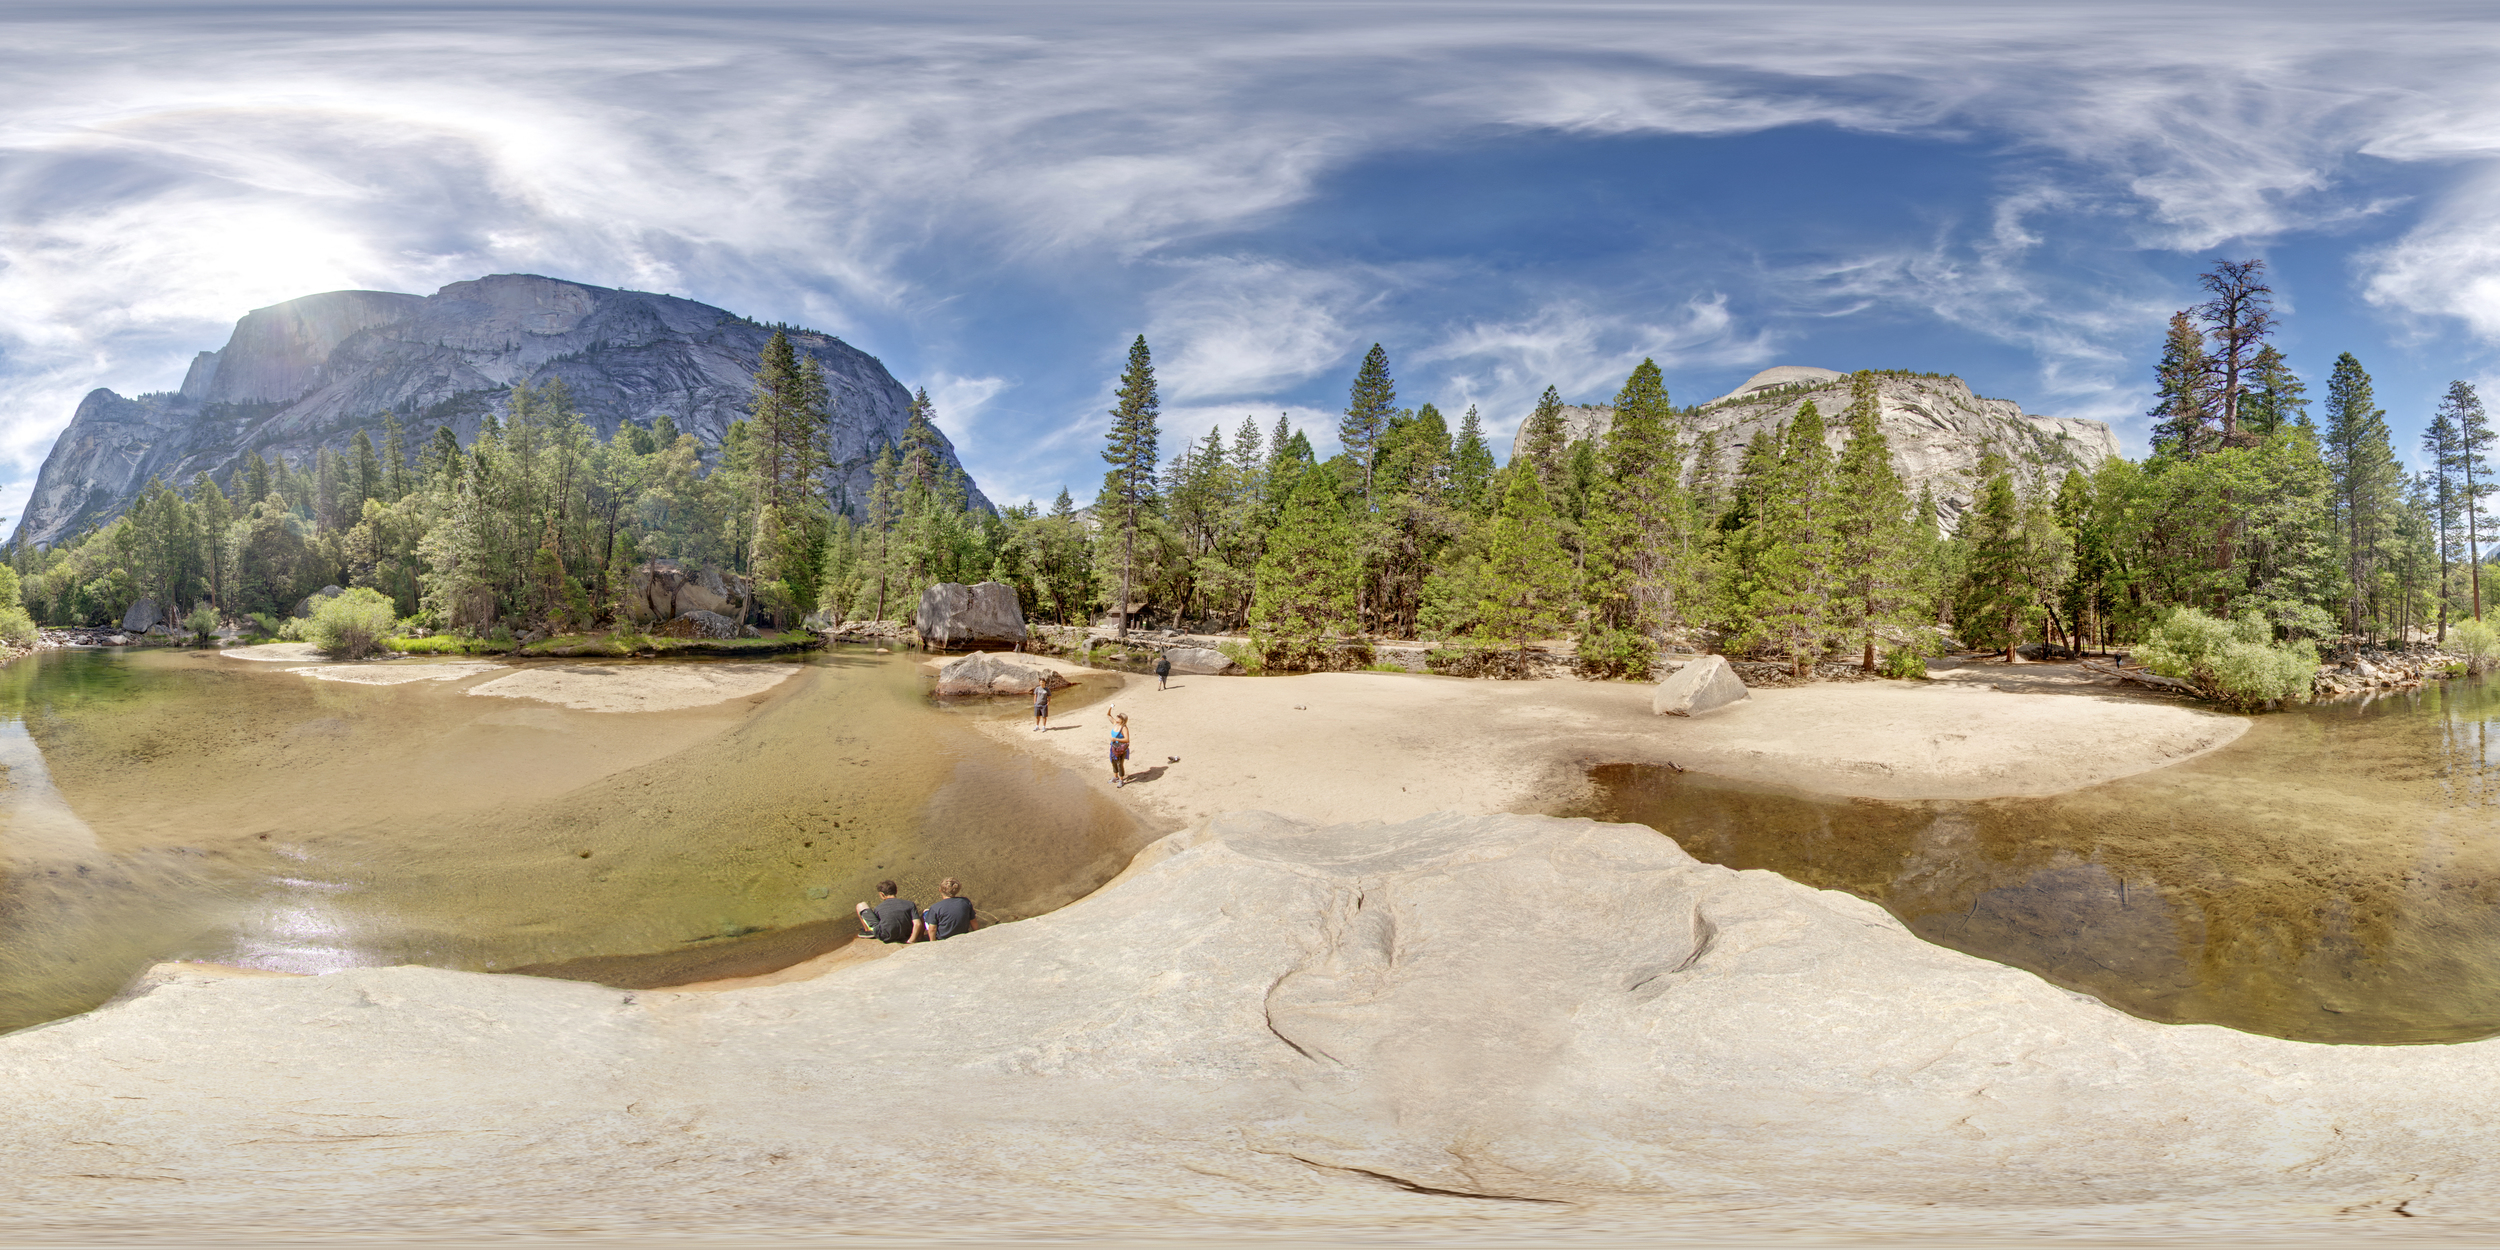 360º Landscape; View of Mirror Lake at Yosemite National Park.